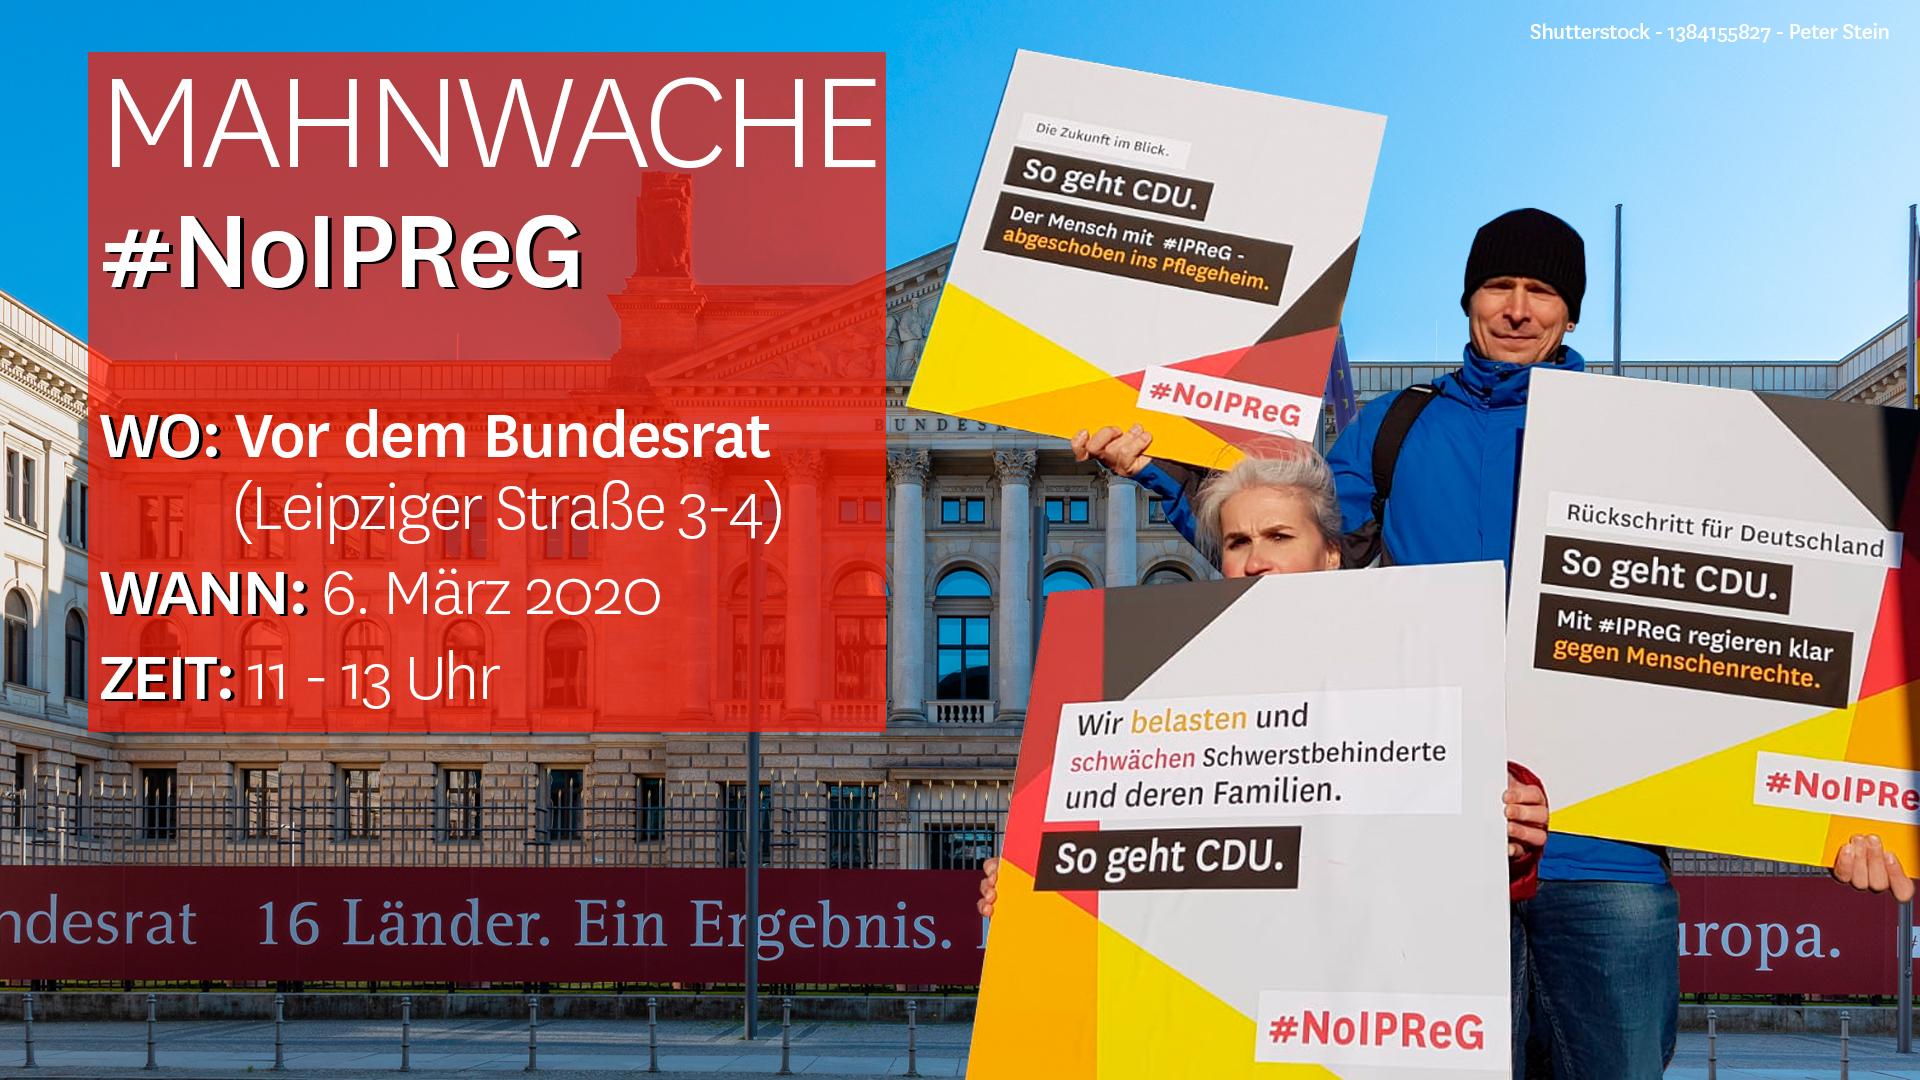 GIP-Intensivpflege-Mahnwache-IPReG-Bundesrat-03-2020